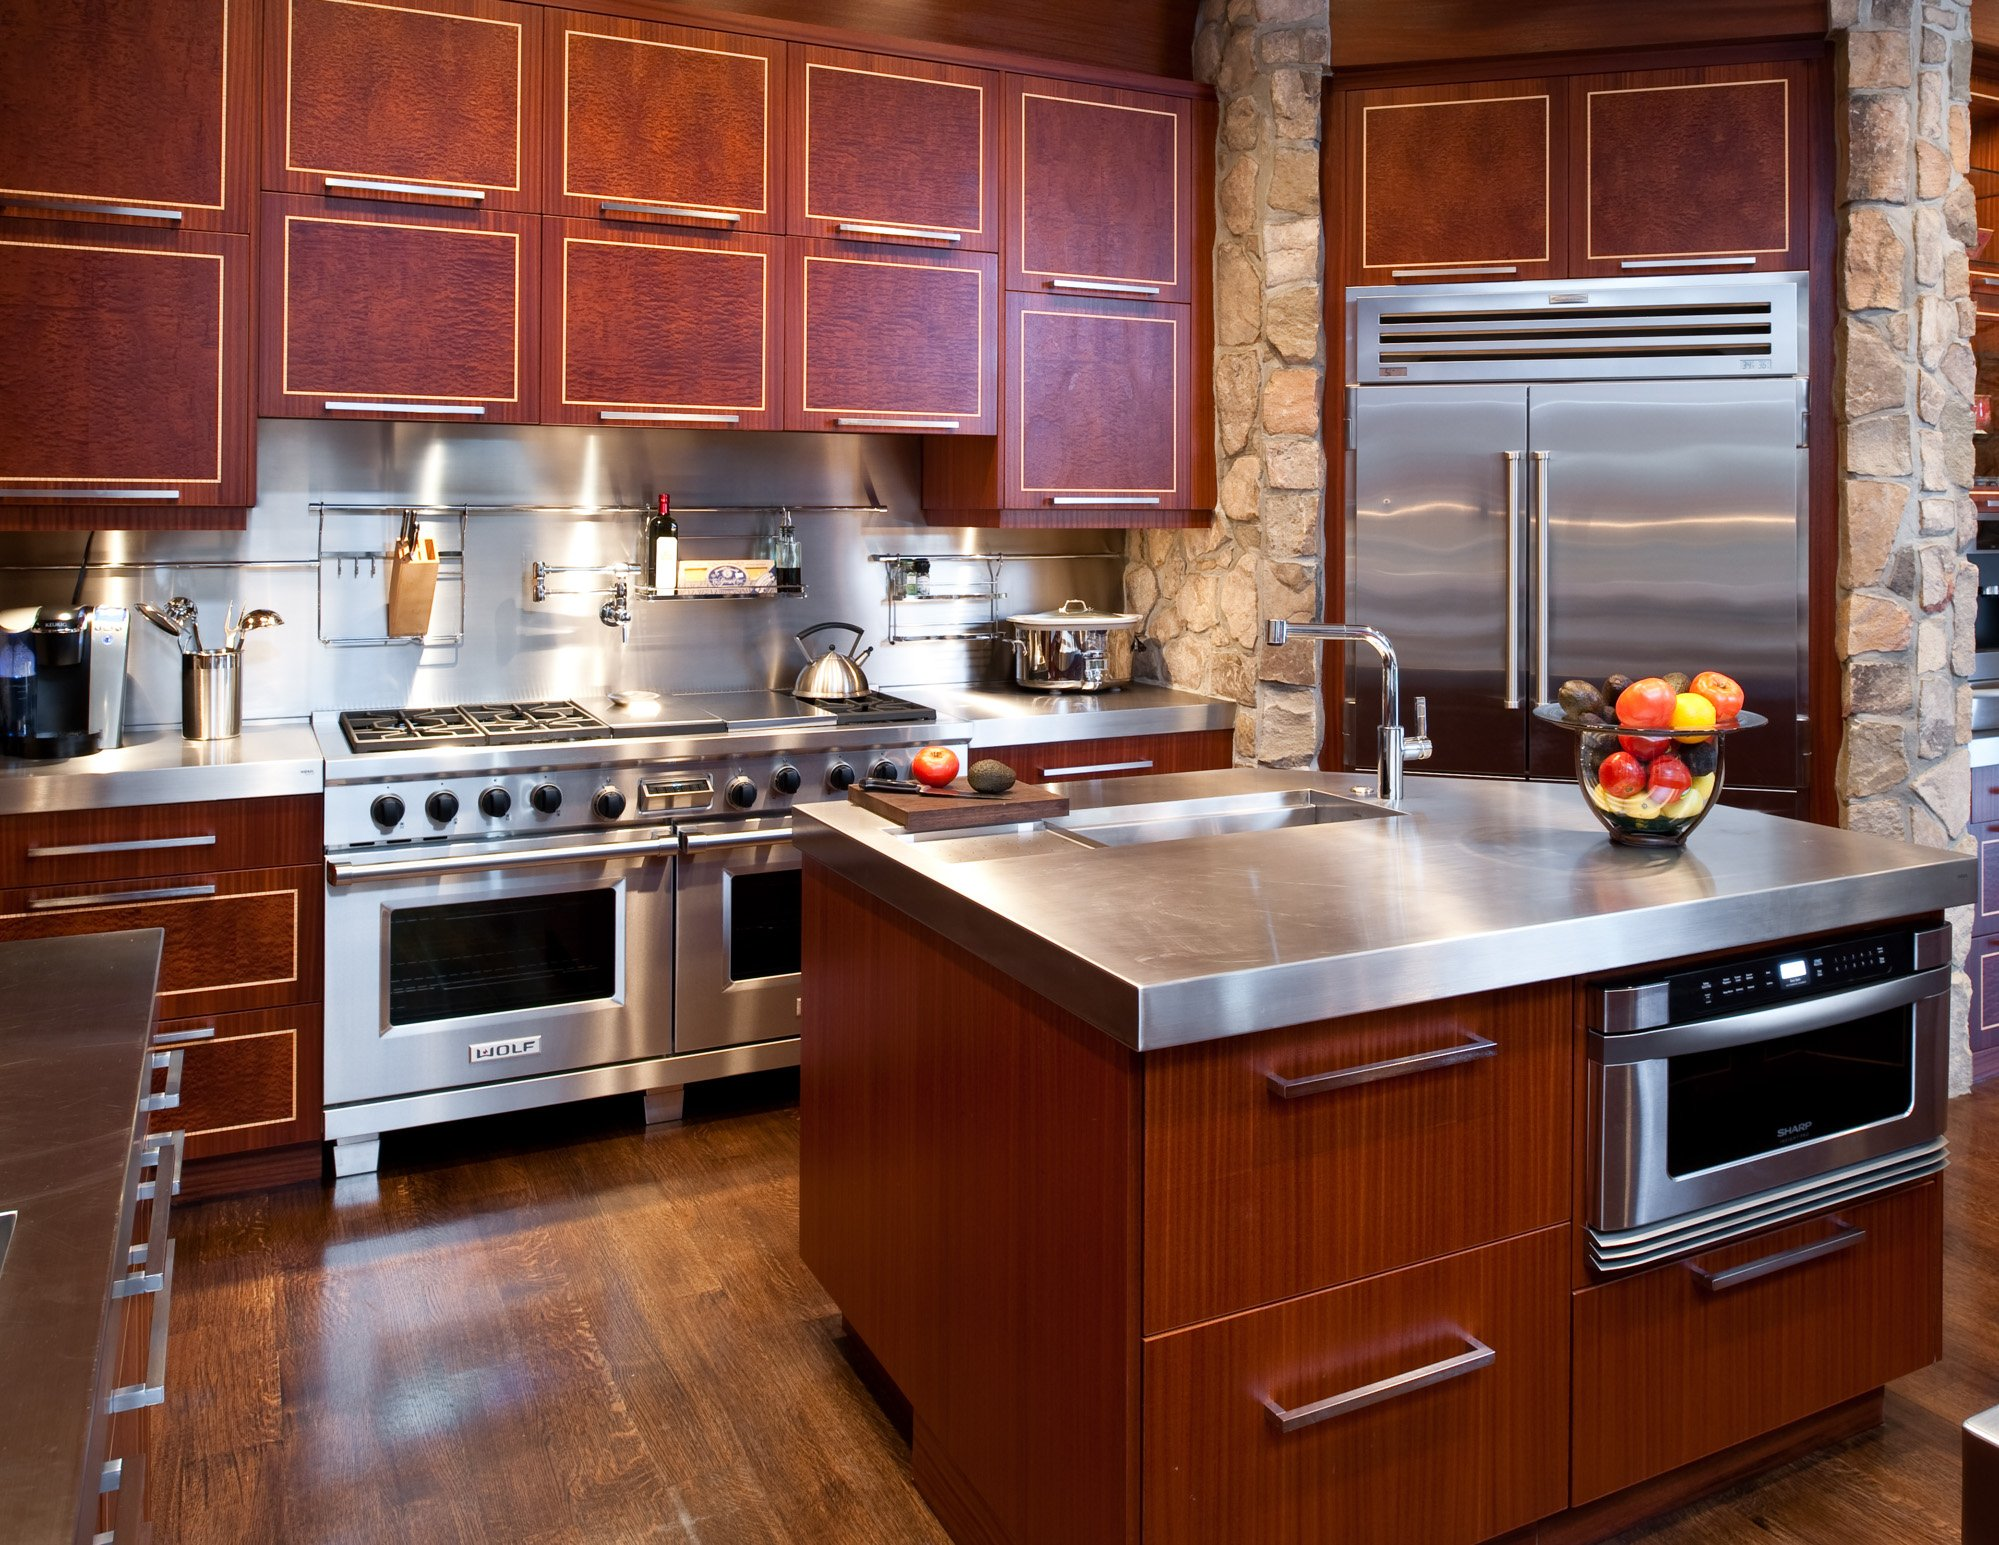 Manganaro, T&G- 2009- Kitchen- Neff Mahogany w Inlay- Contemporary- Stainless steel countertop and backsplash, microwave drawer, trough sink, backsplash rack- The Downs